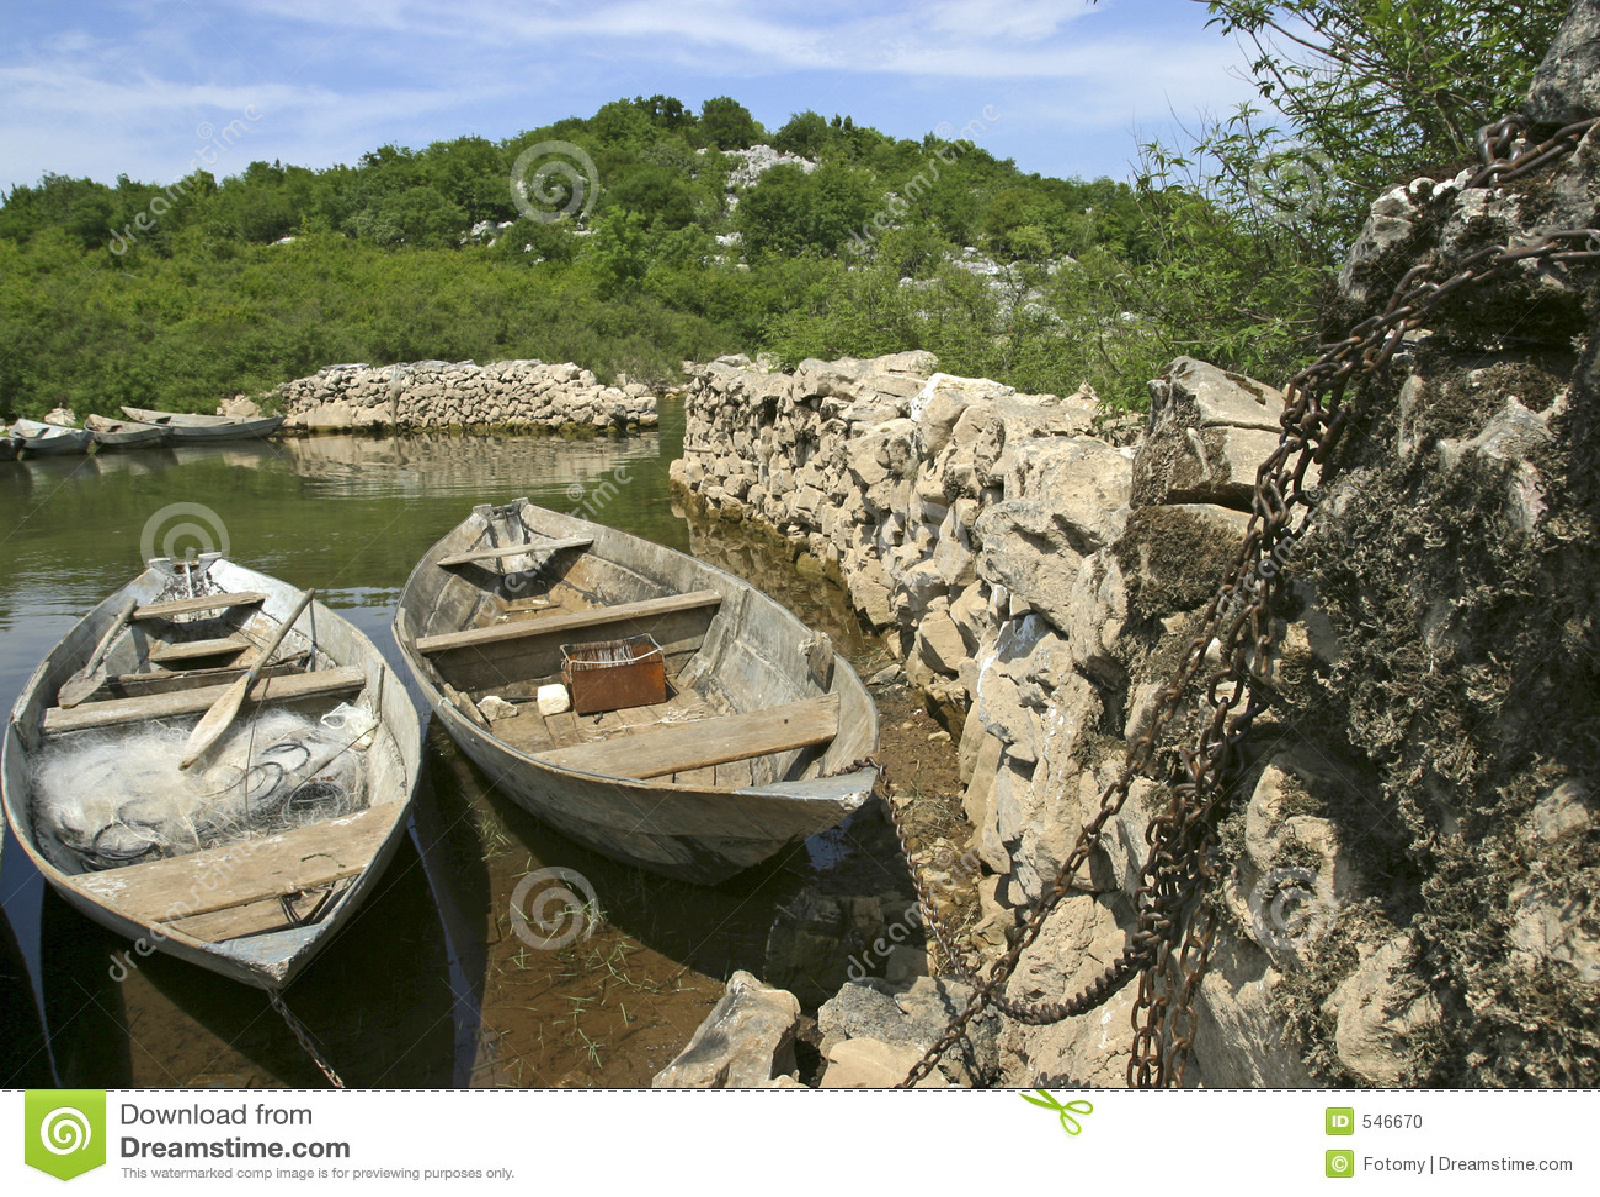 Download 小船钓鱼传统 库存照片. 图片 包括有 废弃, 忽略, 形状, 自然, 长满的, 节假日, 颜色, 手工制造 - 546670